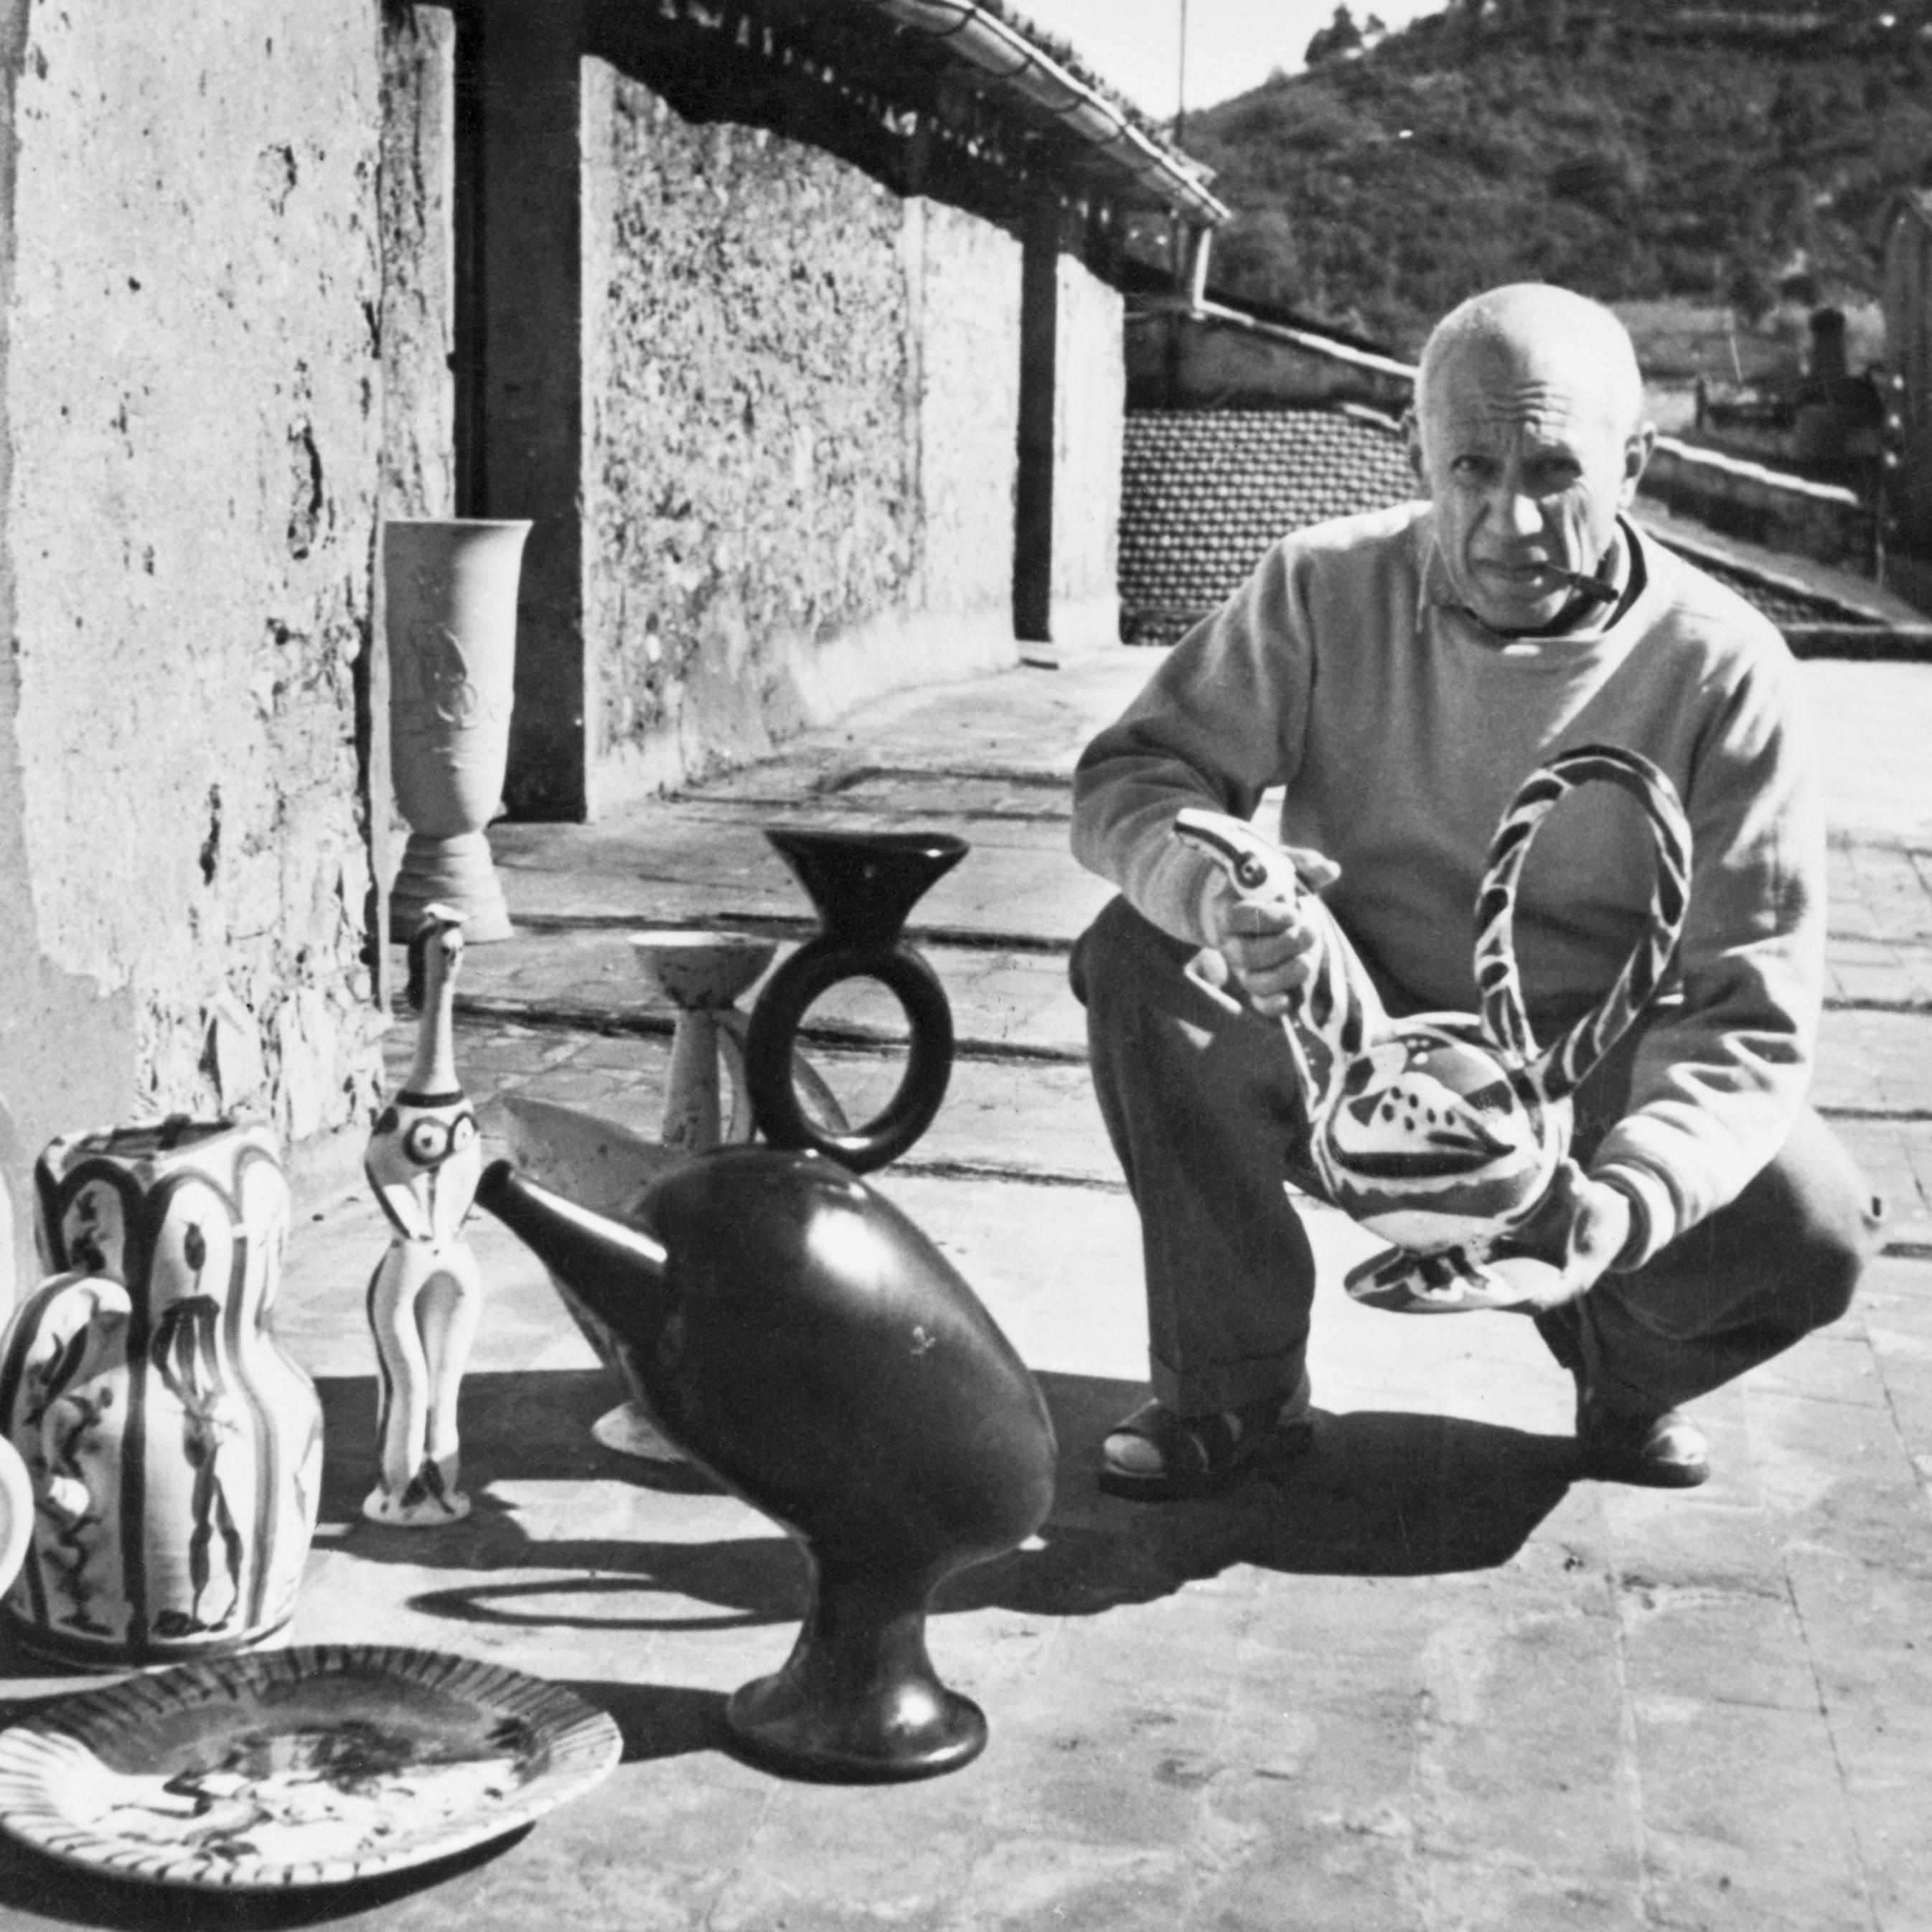 Ceramics: Picasso's Other Art Form